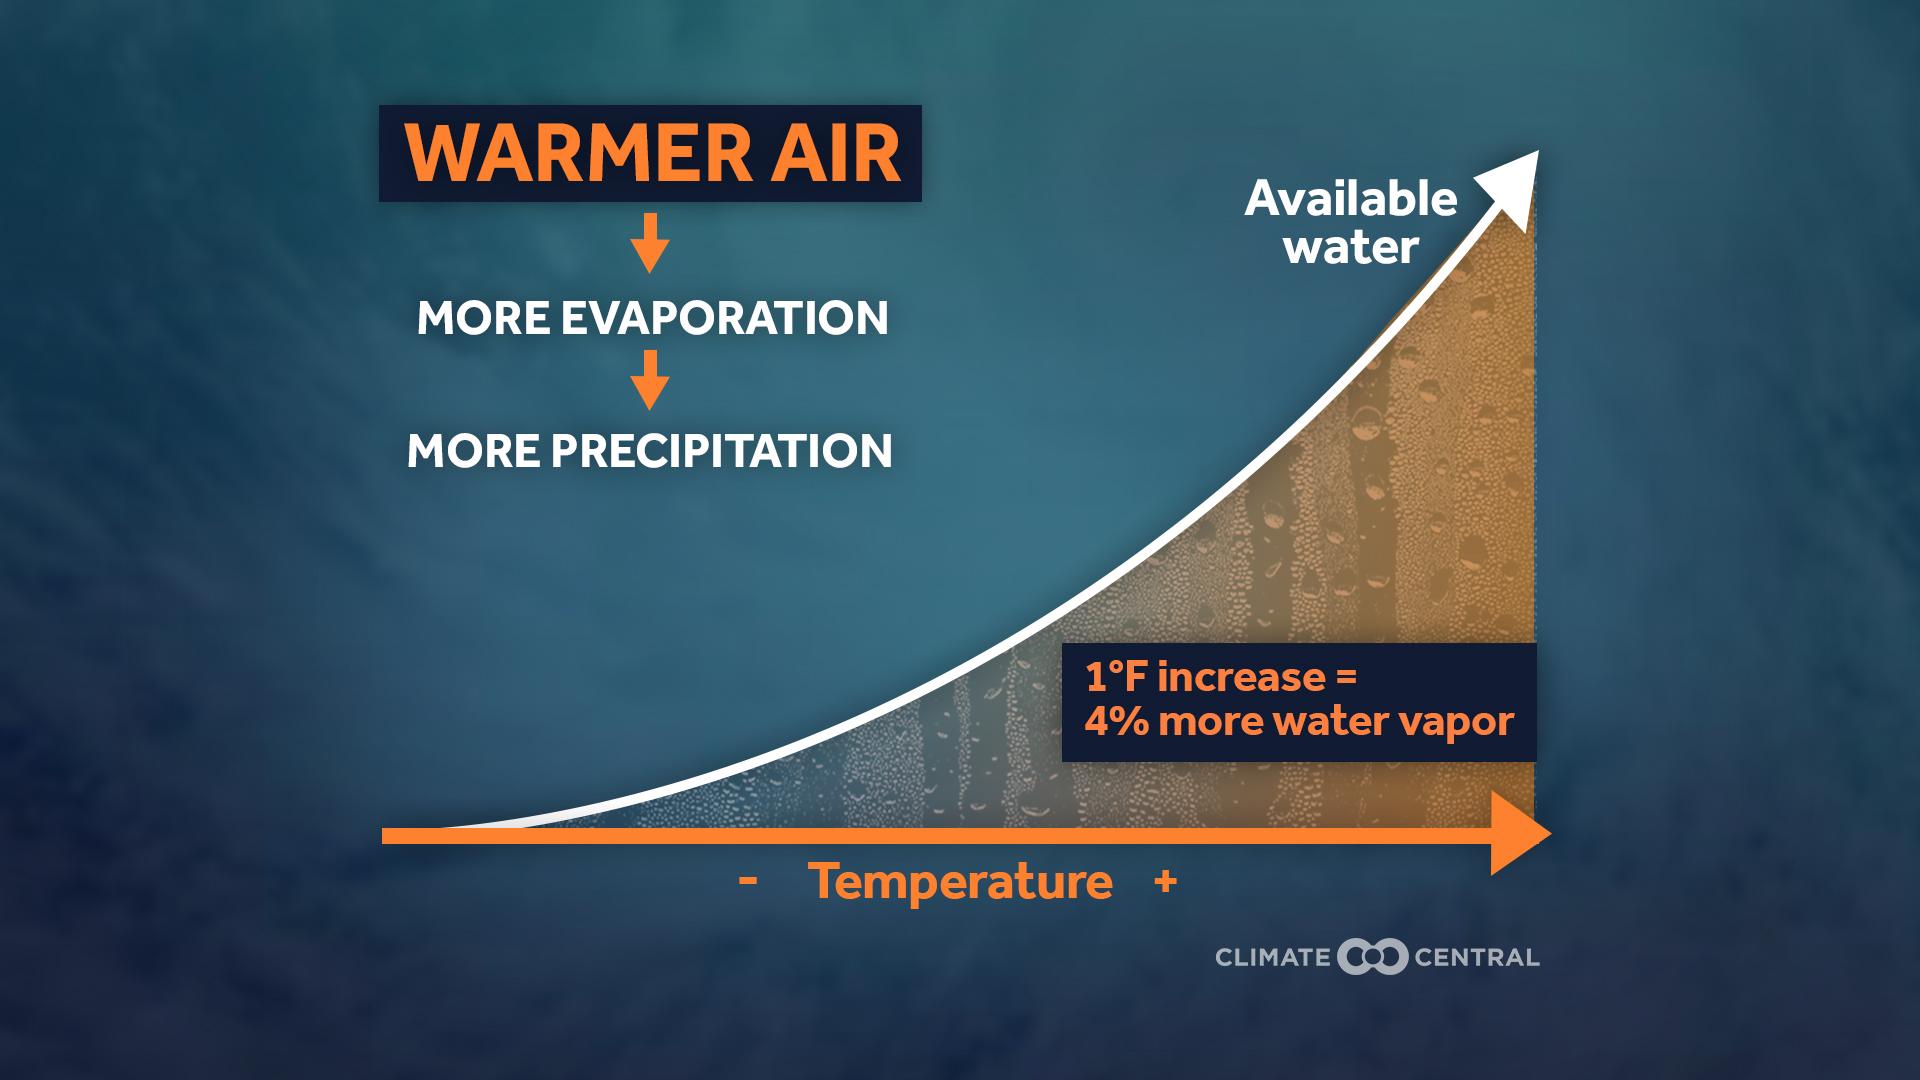 Warmer Air Means More Evaporation And Precipitation